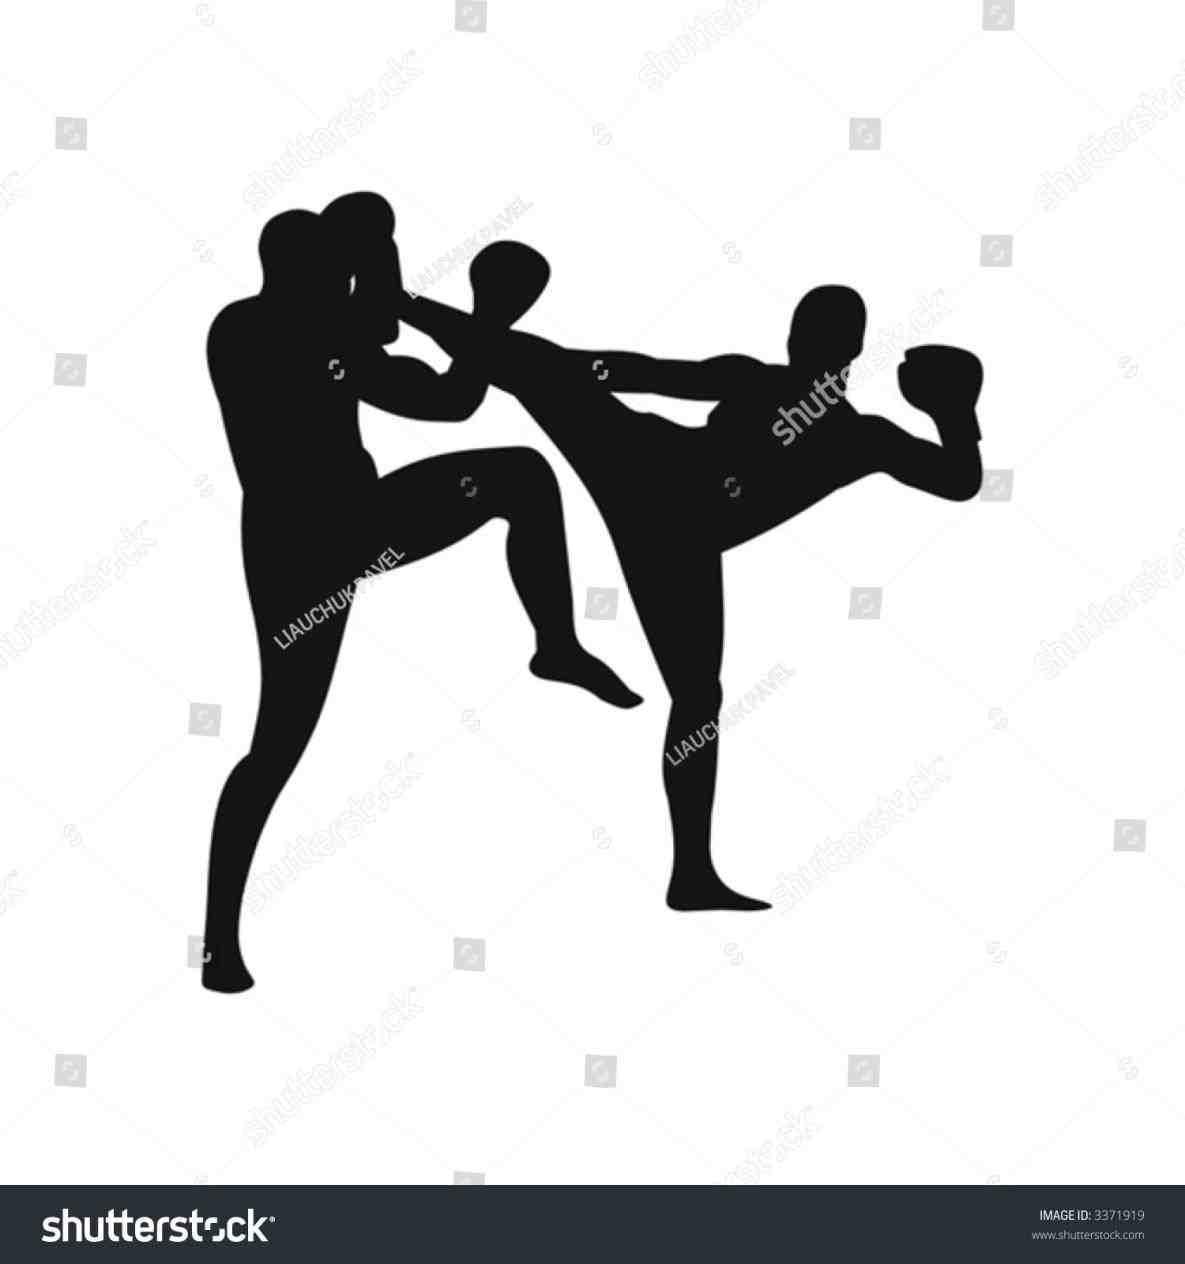 1185x1264 Kick Silhouette Straight Up Kick Boxing To Karate U Self Defense